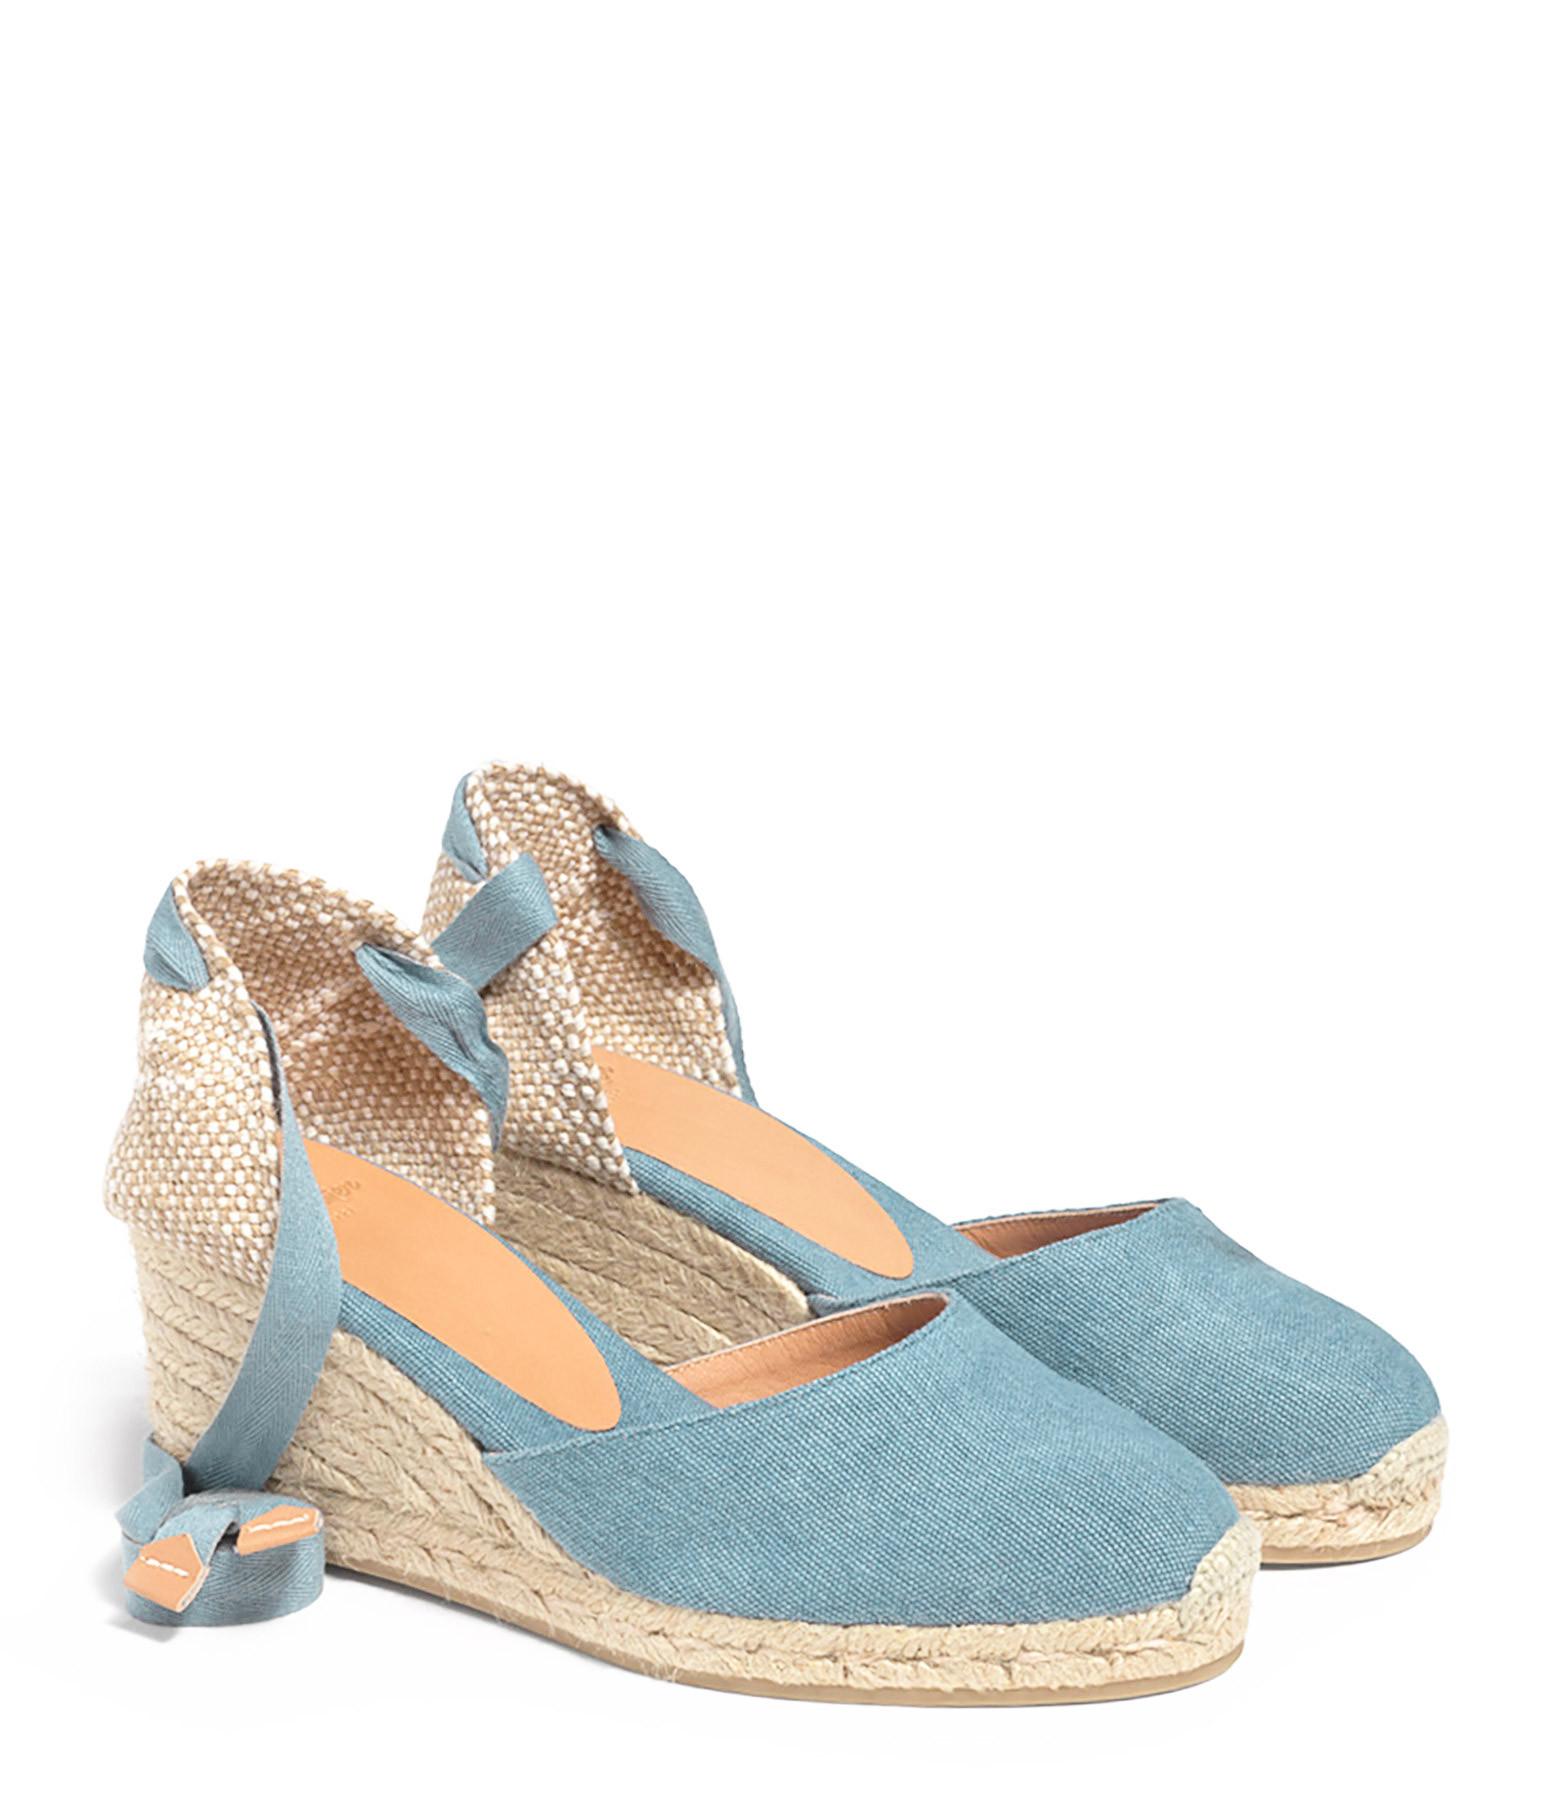 CASTAÑER - Sandales Carina Bleu